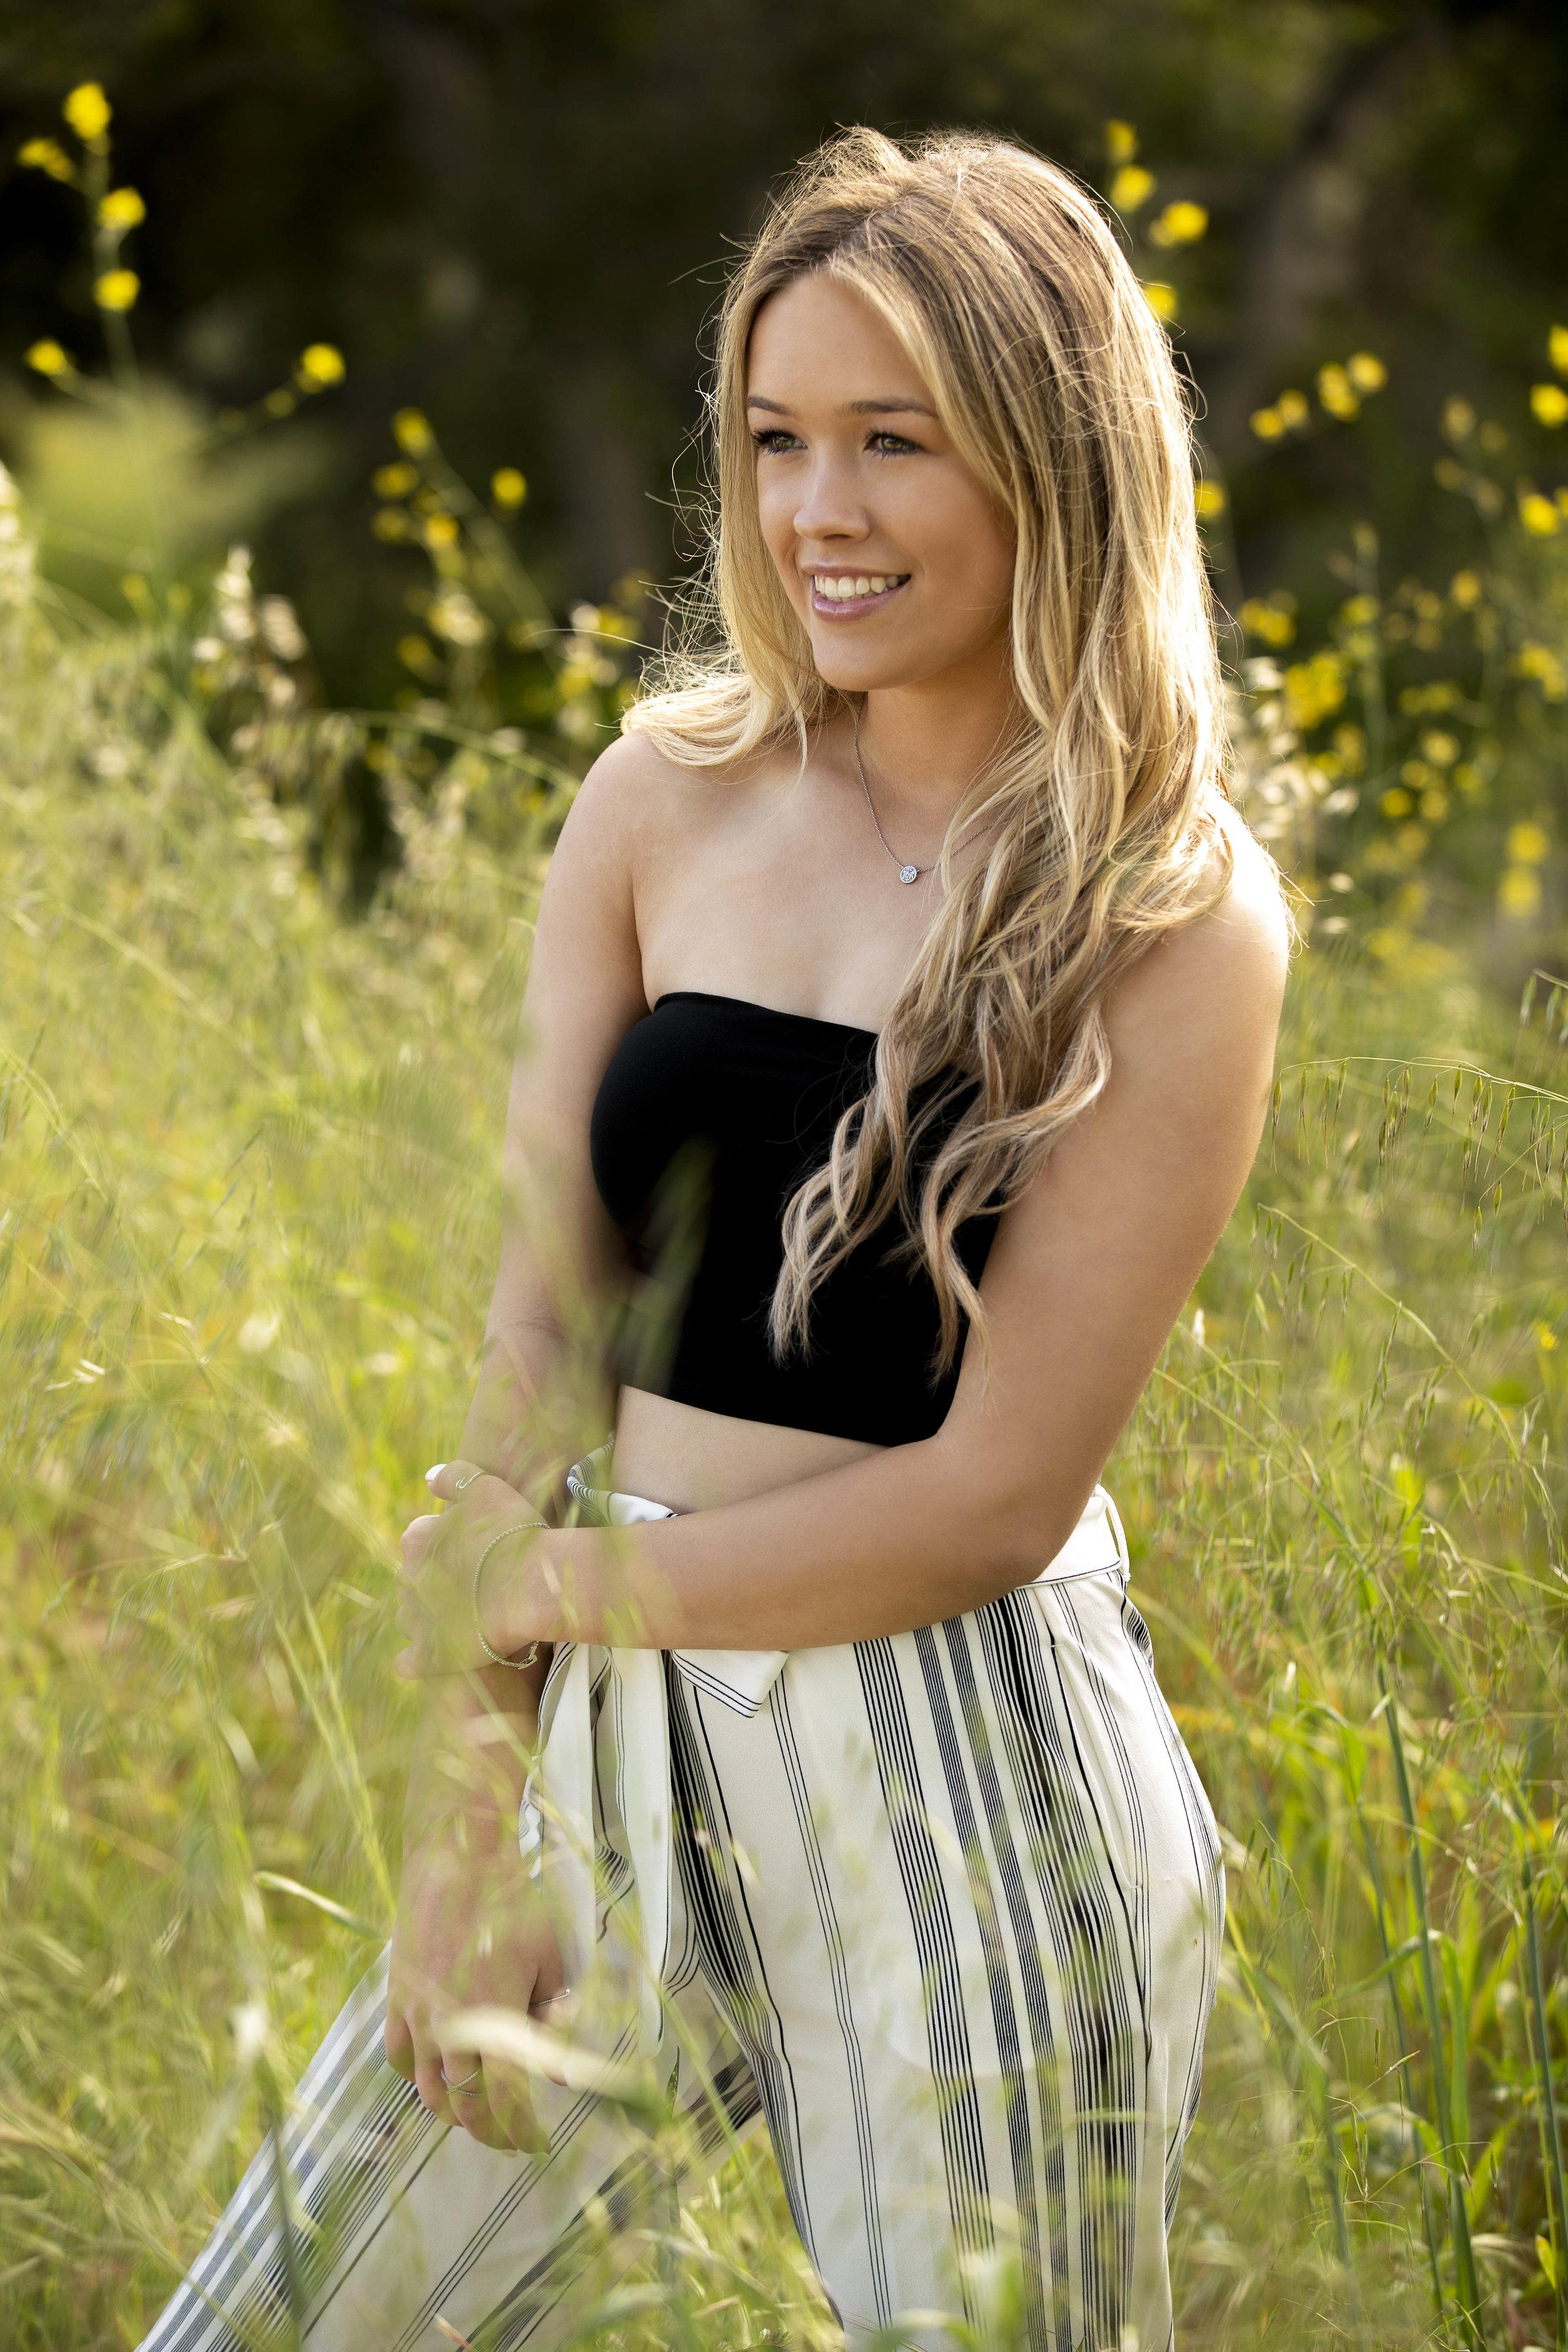 KylieKaufmannBlogPost-1.jpg